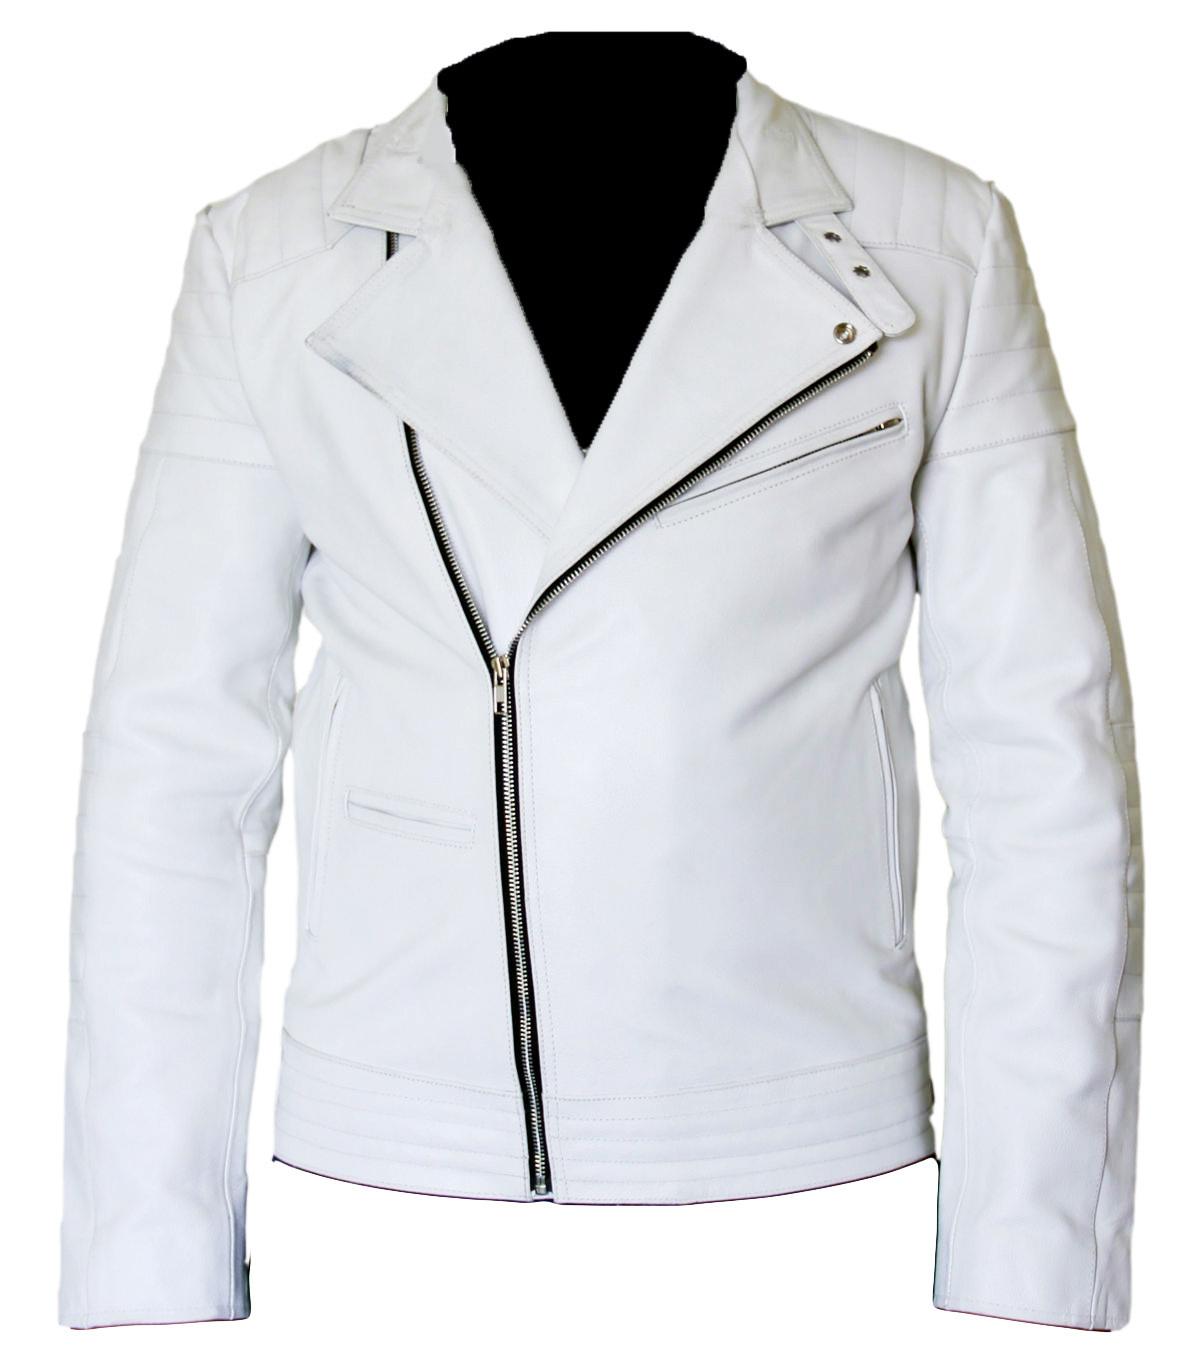 51f4e12a3c5464 Stylish Brando White Leather Jacket For and similar items